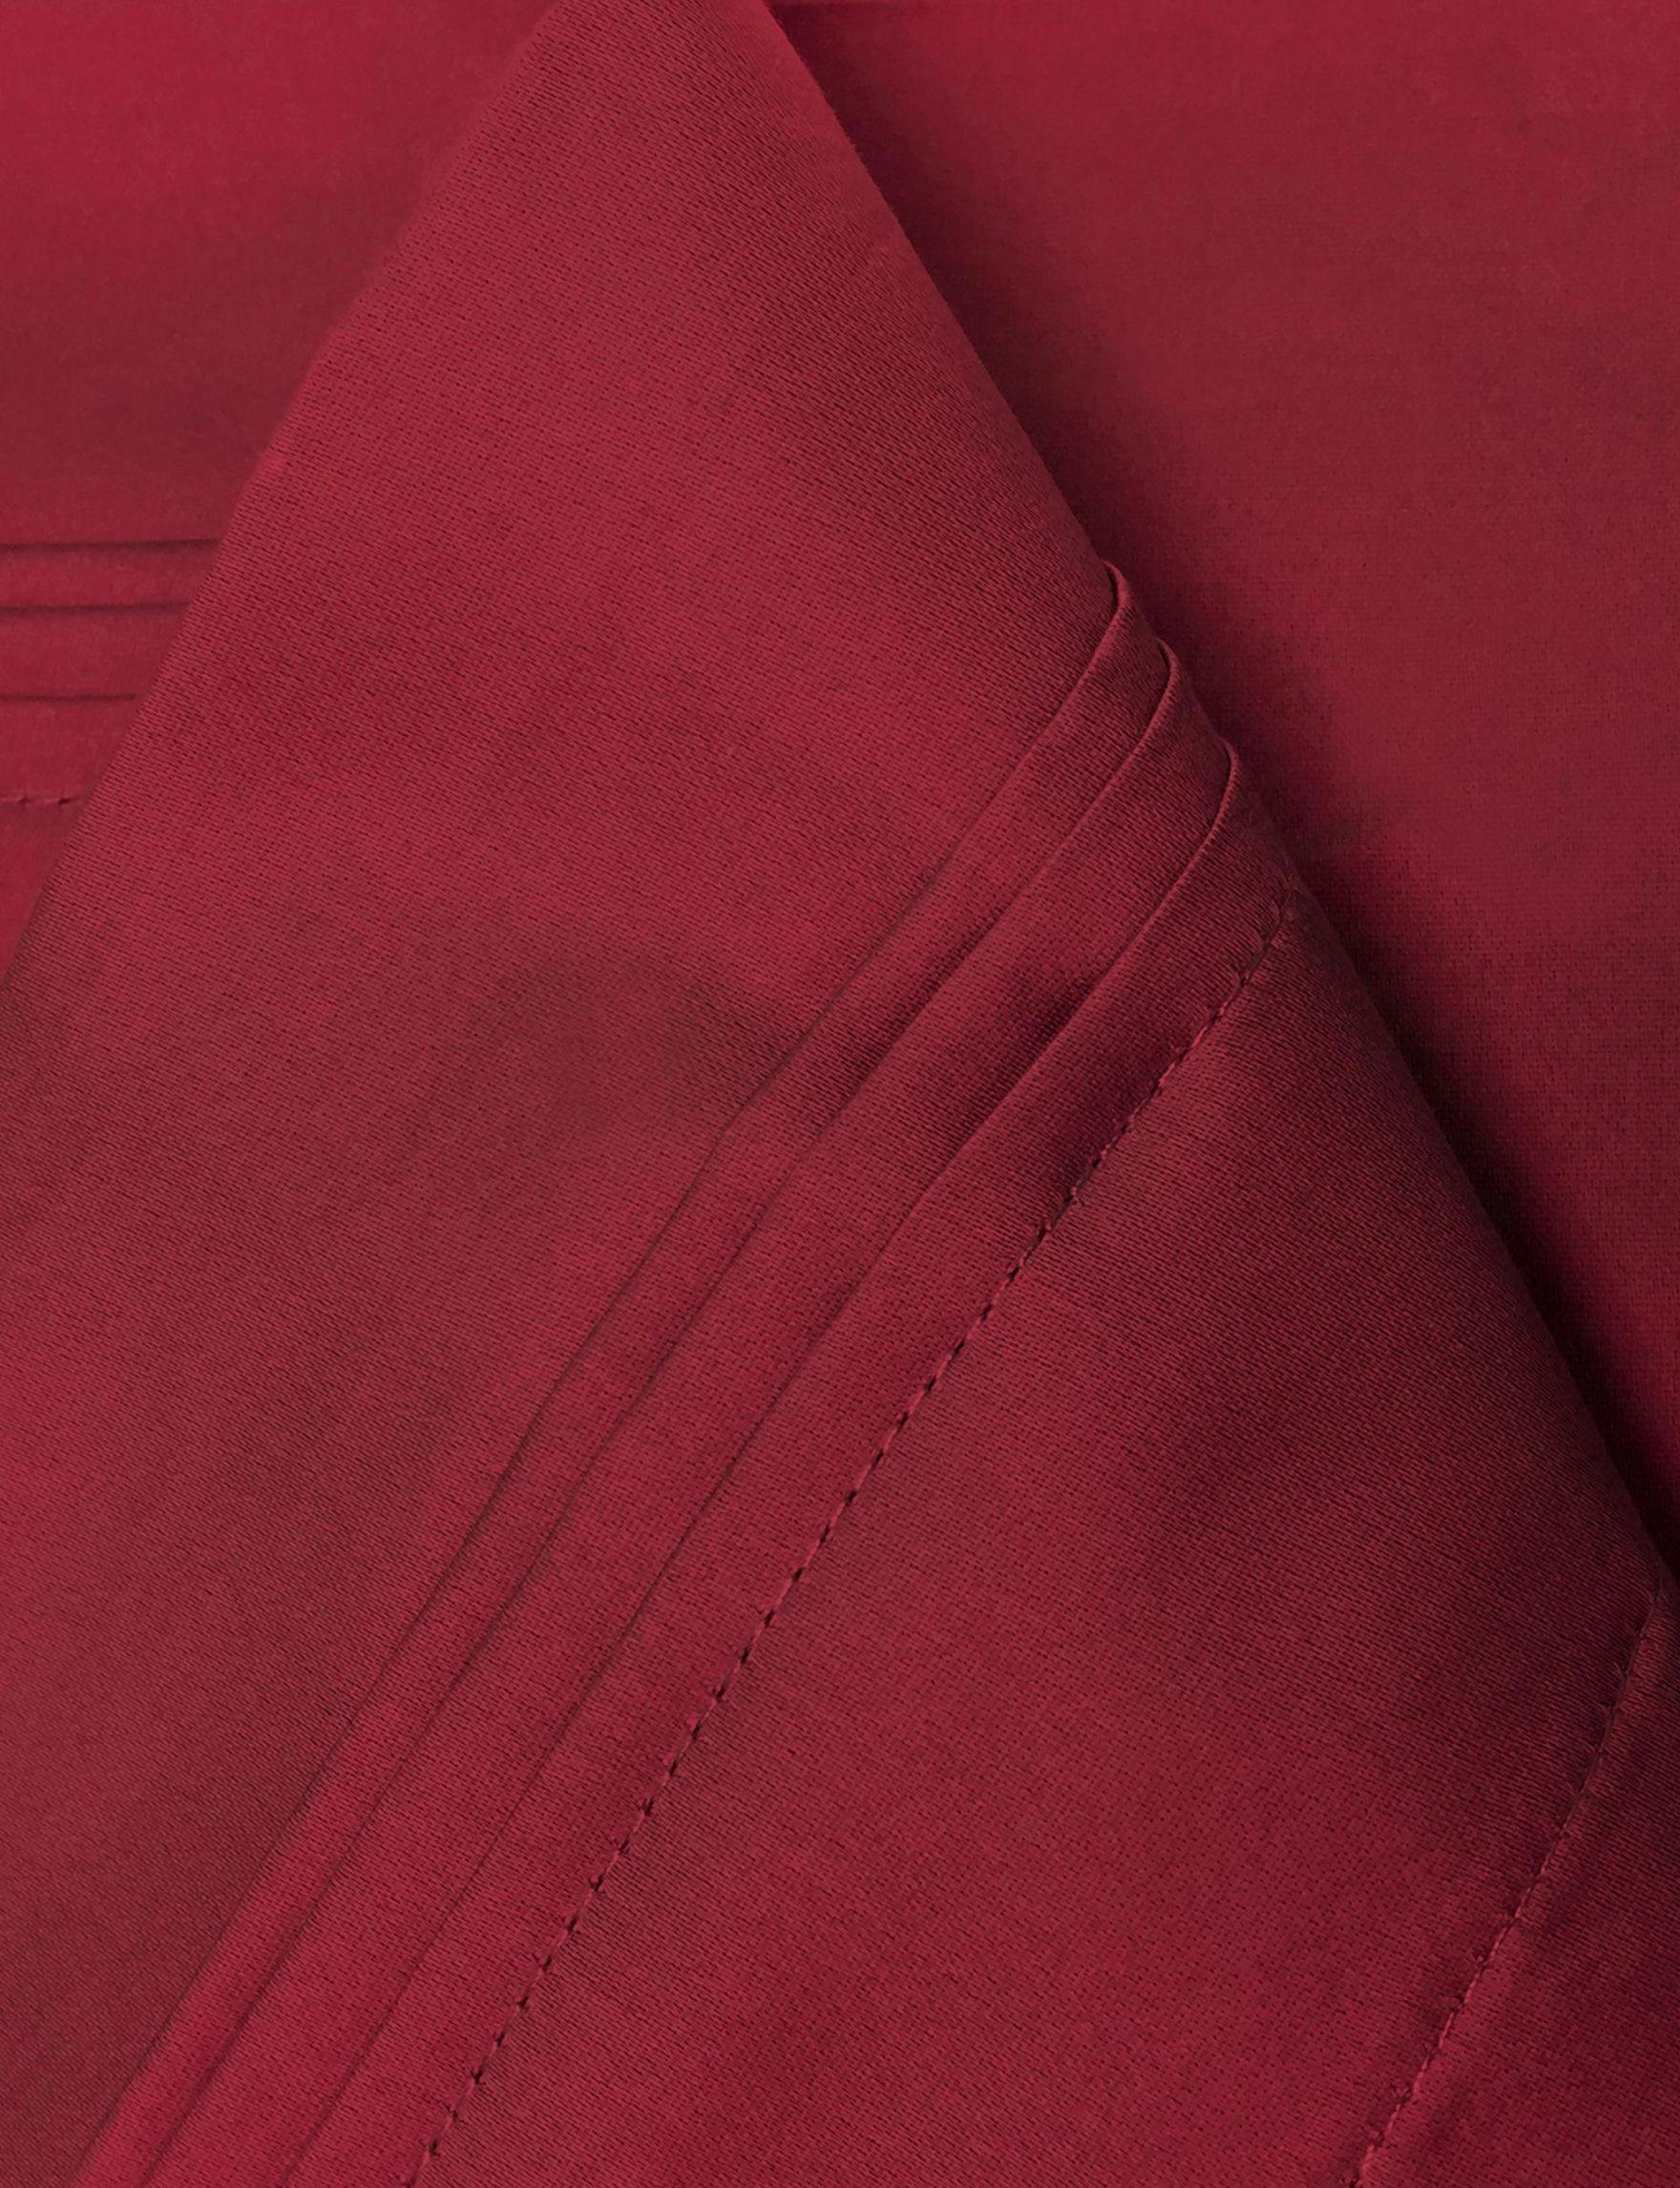 Superior Burgundy Sheets & Pillowcases